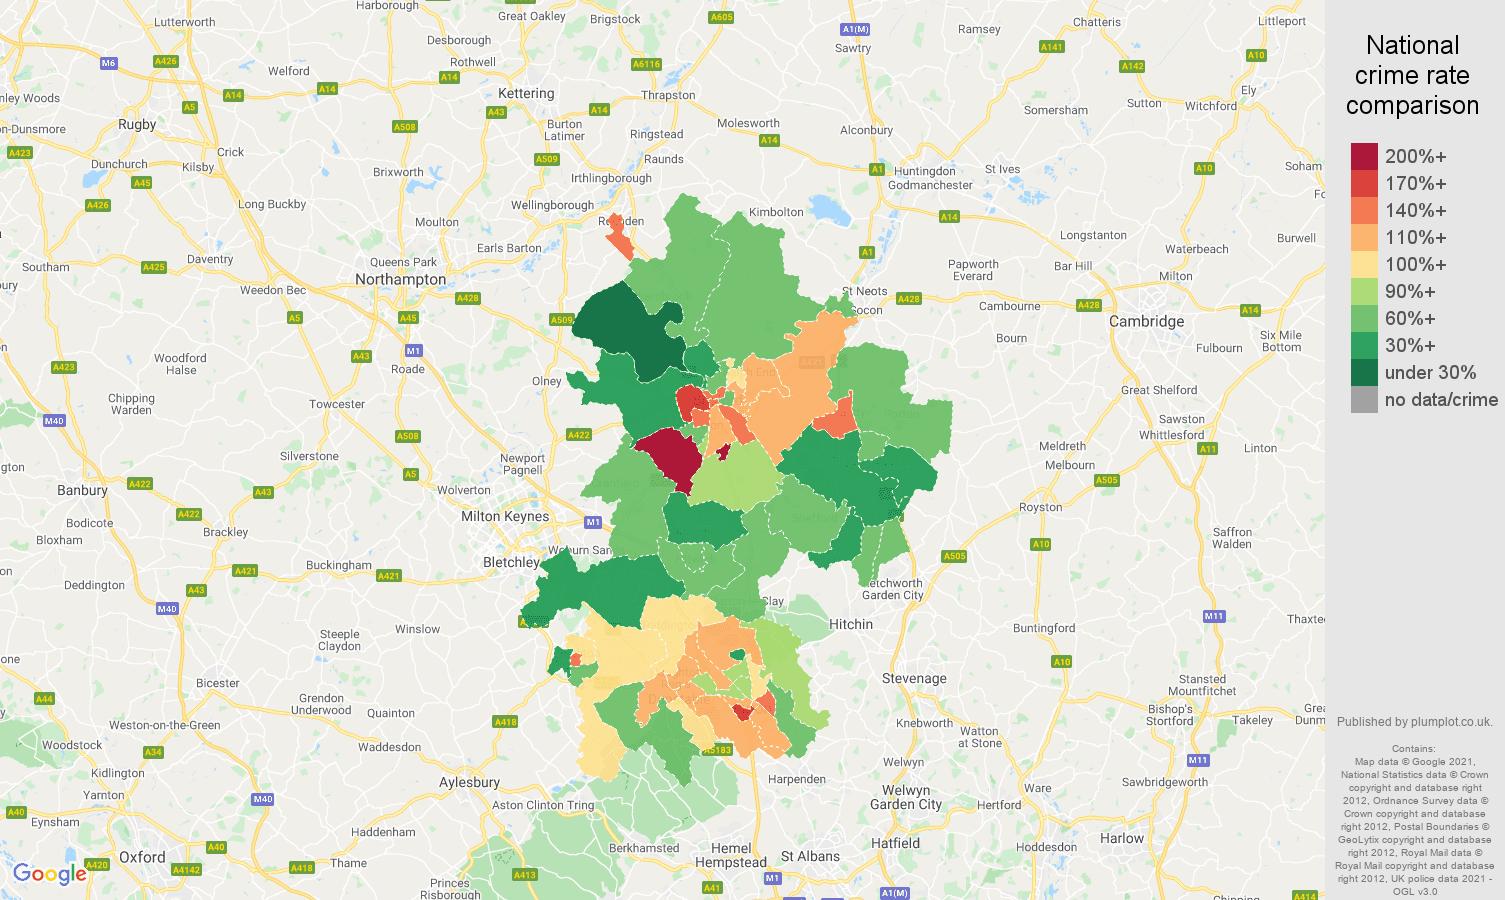 Bedfordshire criminal damage and arson crime rate comparison map